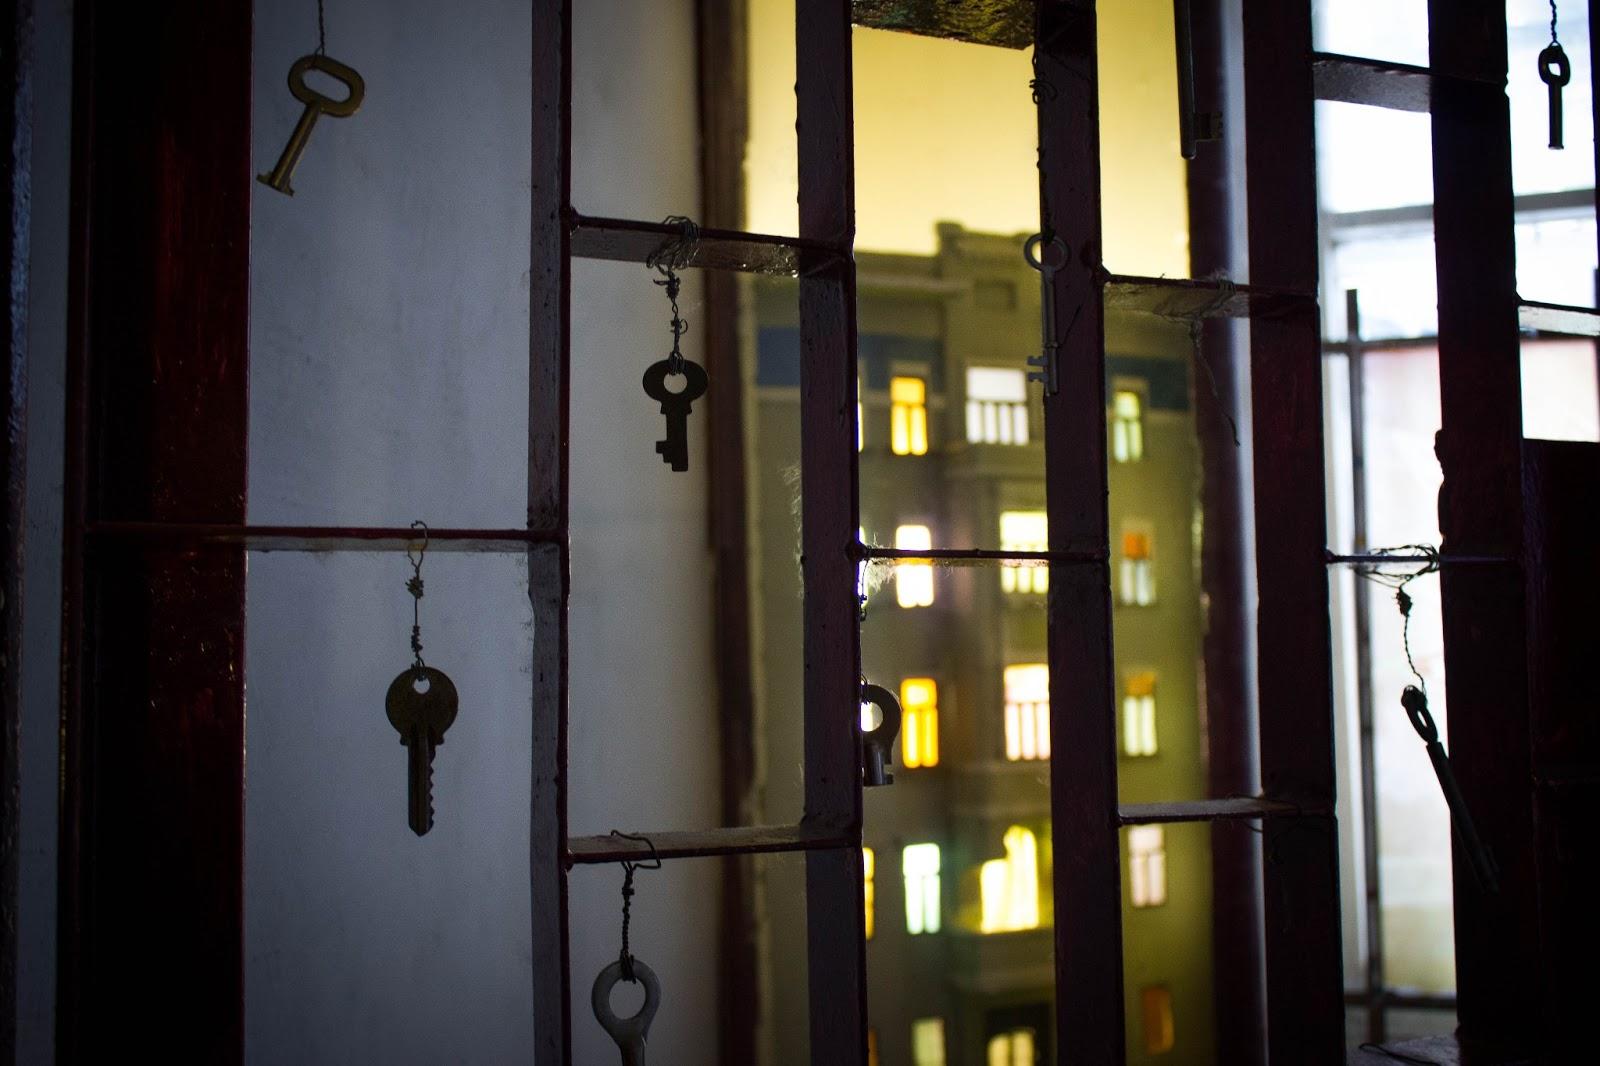 Дом музей Булгакова, Мастер и Маргарита, Ключи от всех окон